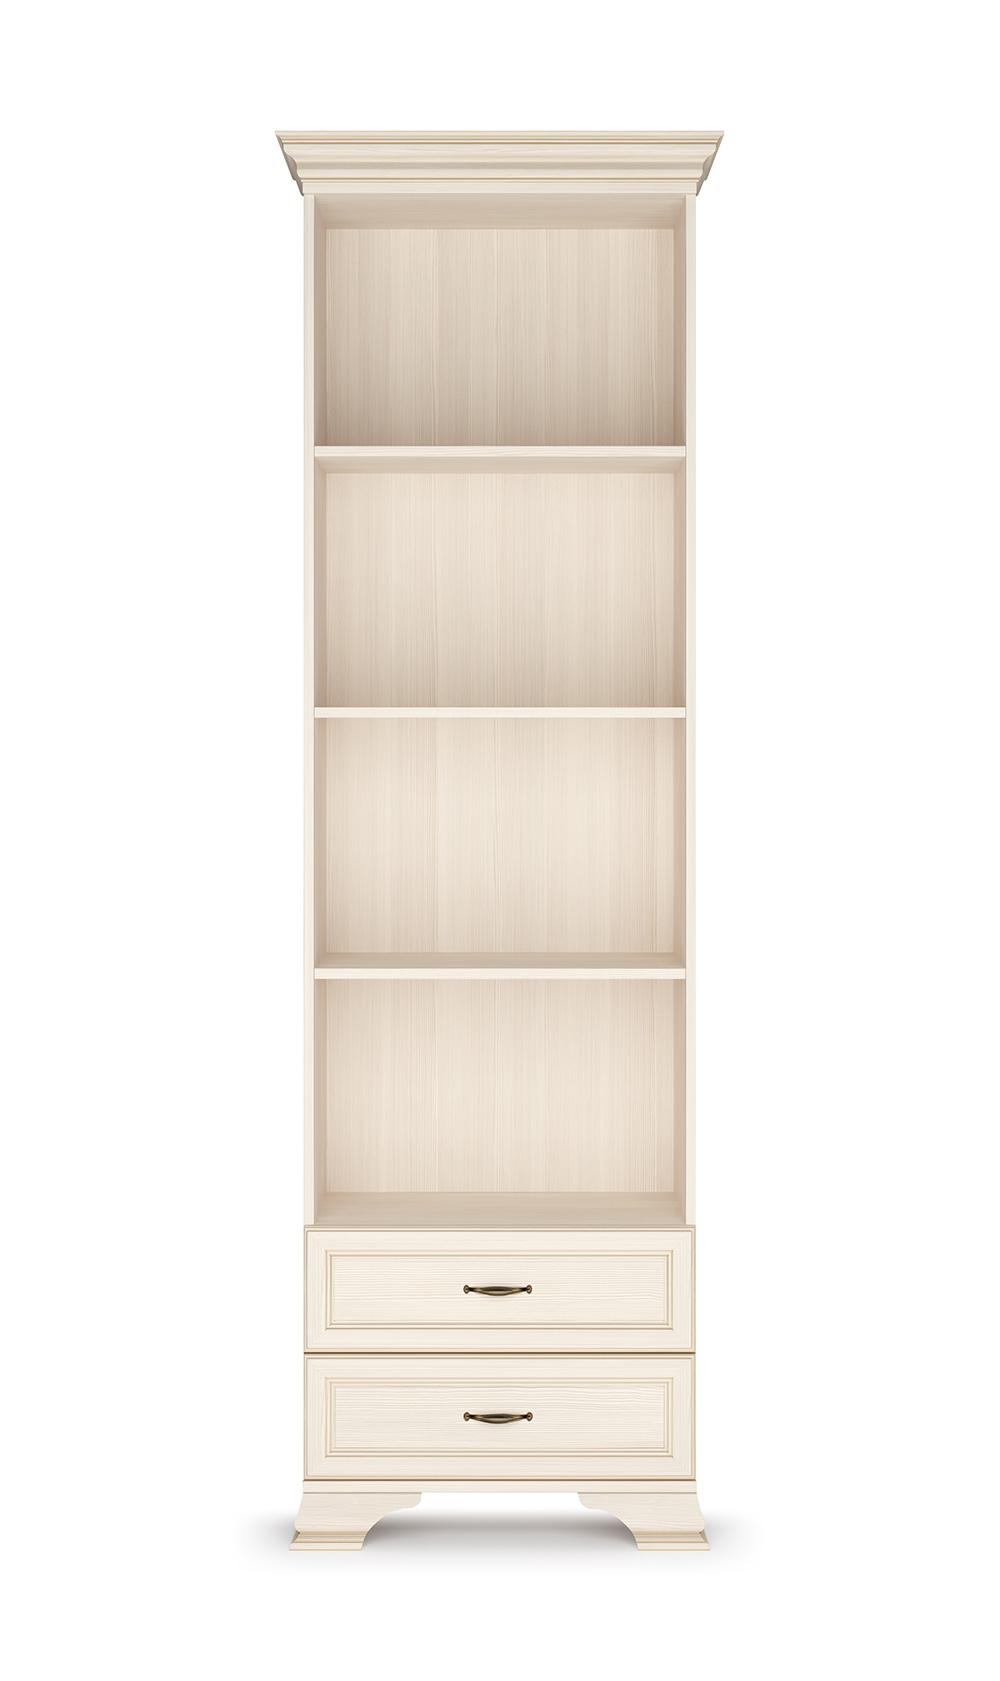 Шкаф-стеллаж 600 «Сиена» Кураж